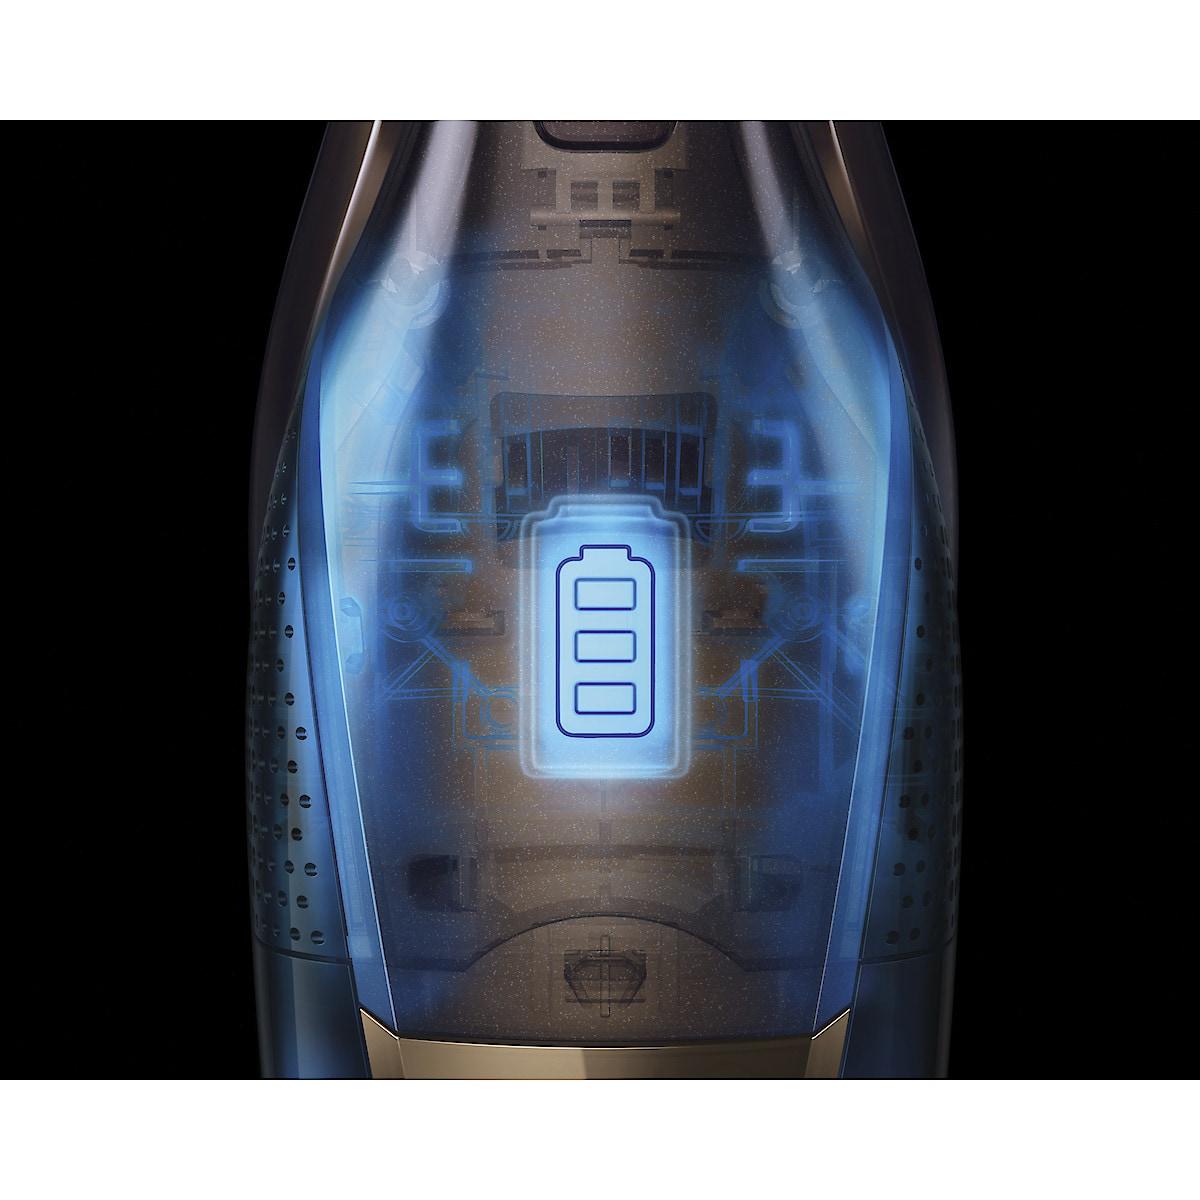 Electrolux Ergorapido EER7GREEN skaftstøvsuger